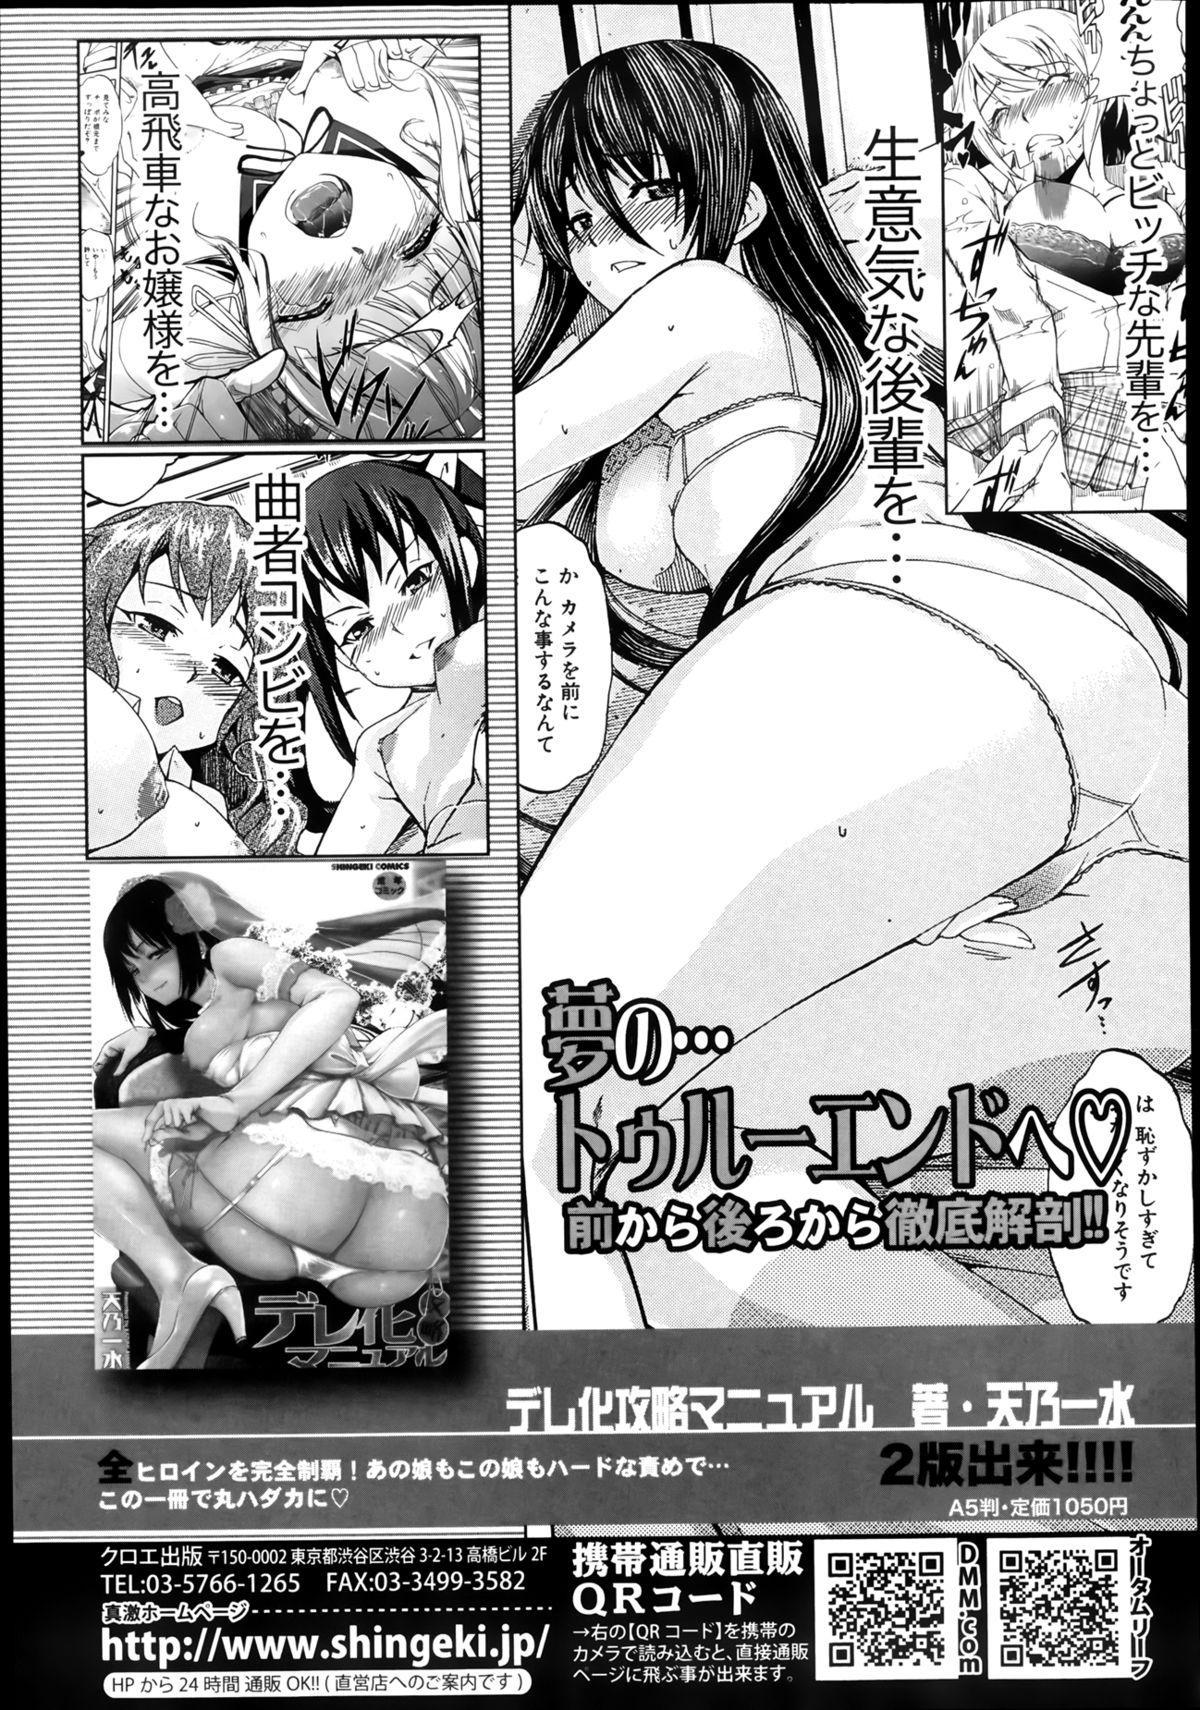 COMIC Shingeki 2013-08 270